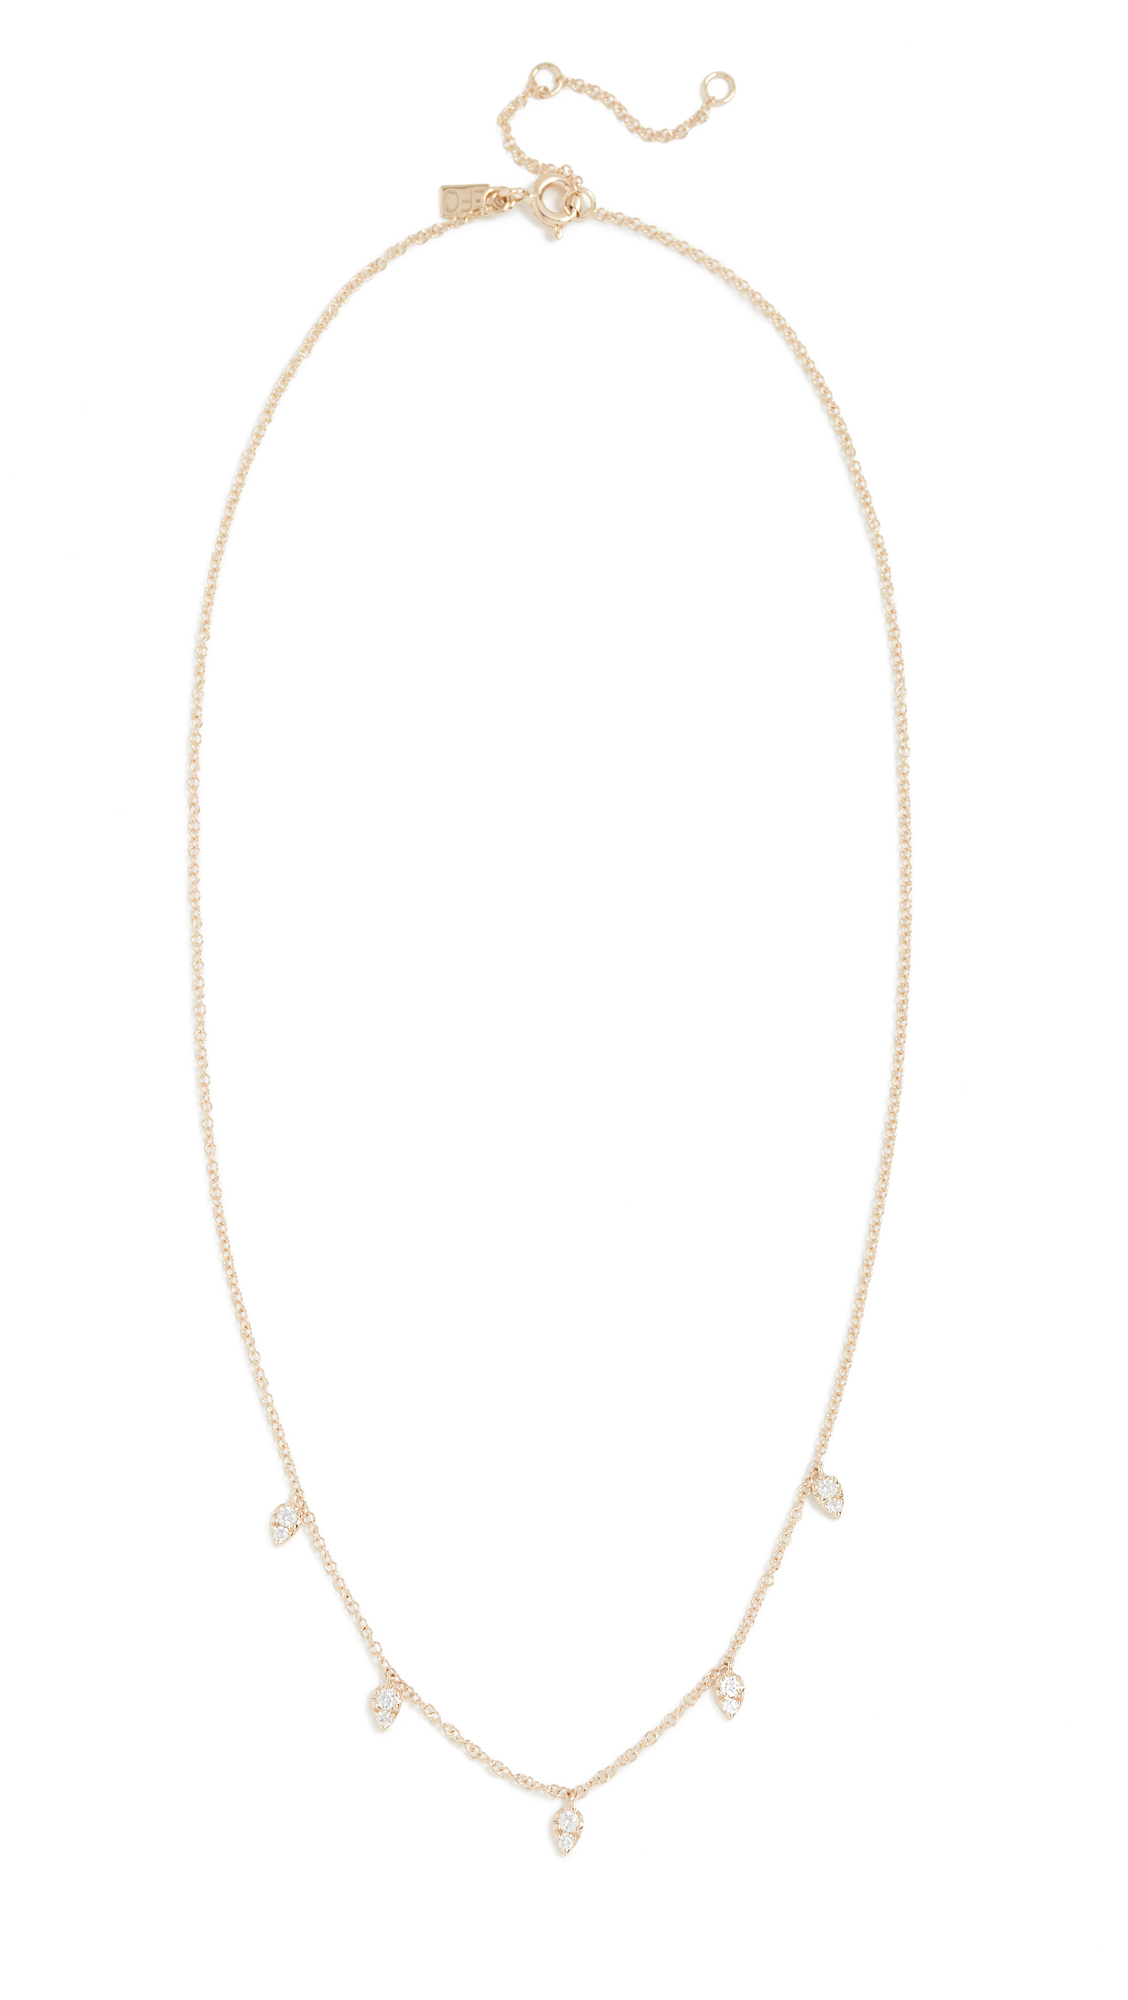 14K Gold Diamond Multi Teardrop Necklace in Yellow Gold